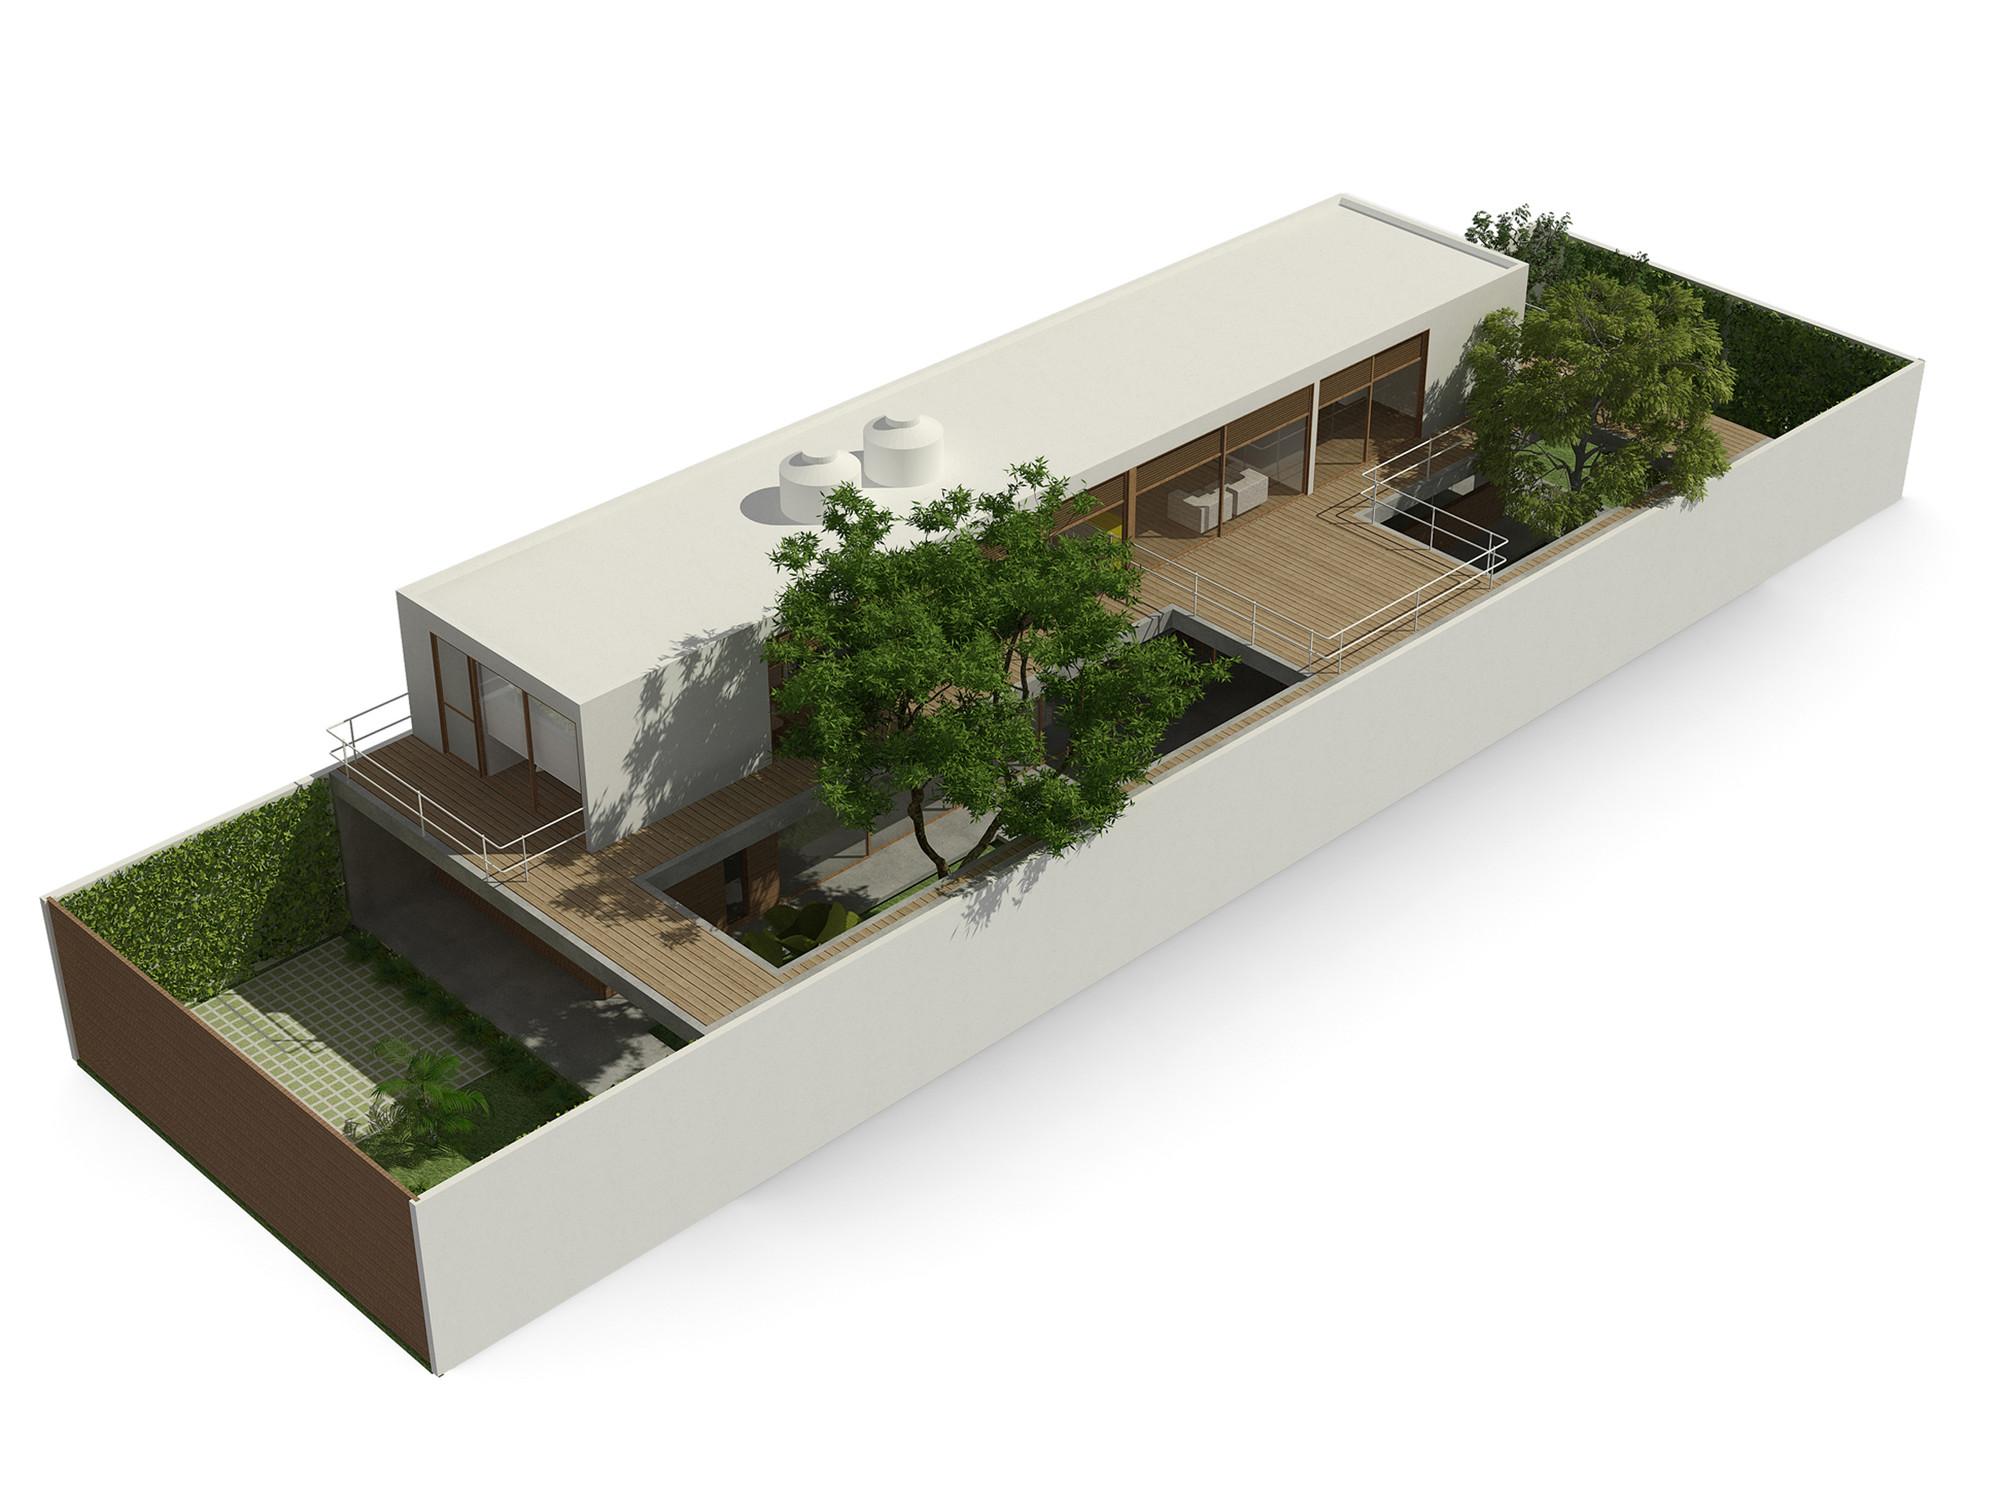 Galeria de casa 10x38 cr2 arquitetura 6 for Wohnlandschaft 2 50 m